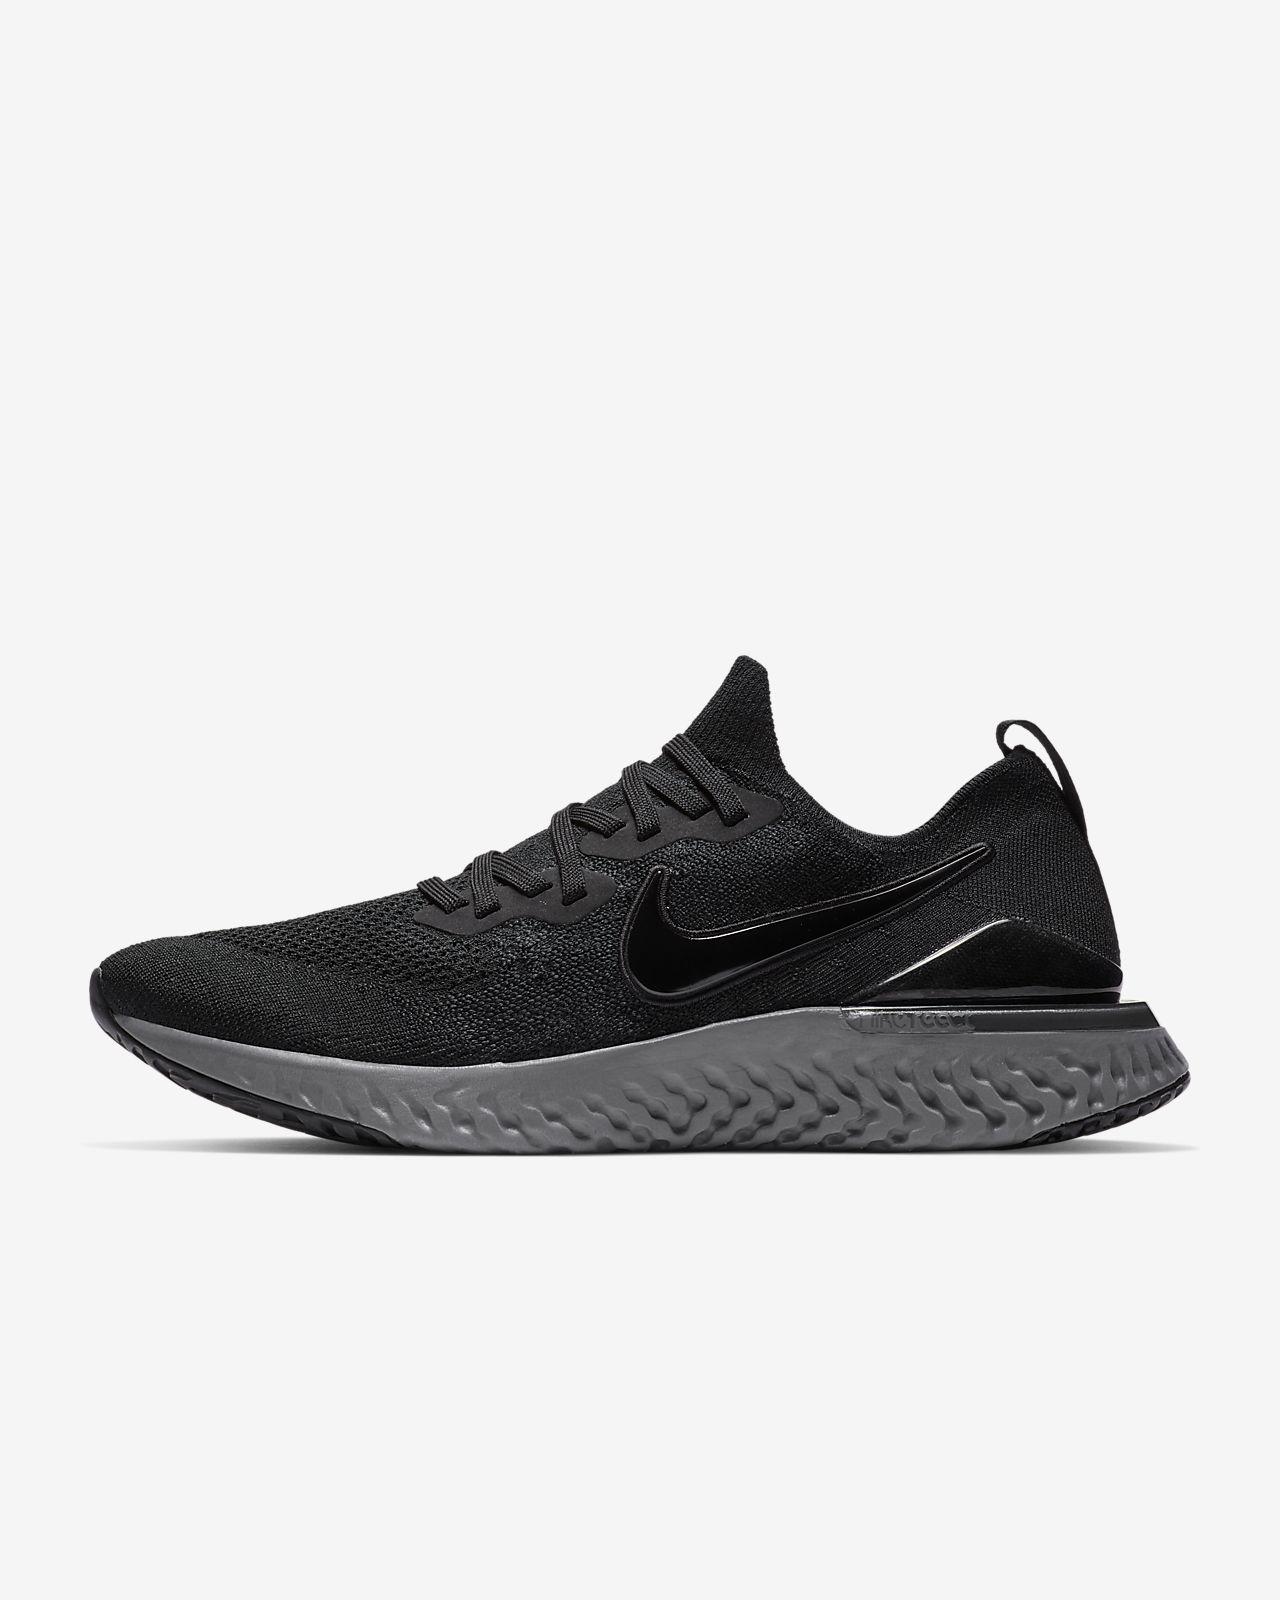 044392610 Nike Epic React Flyknit 2 Zapatillas de running - Hombre. Nike.com ES